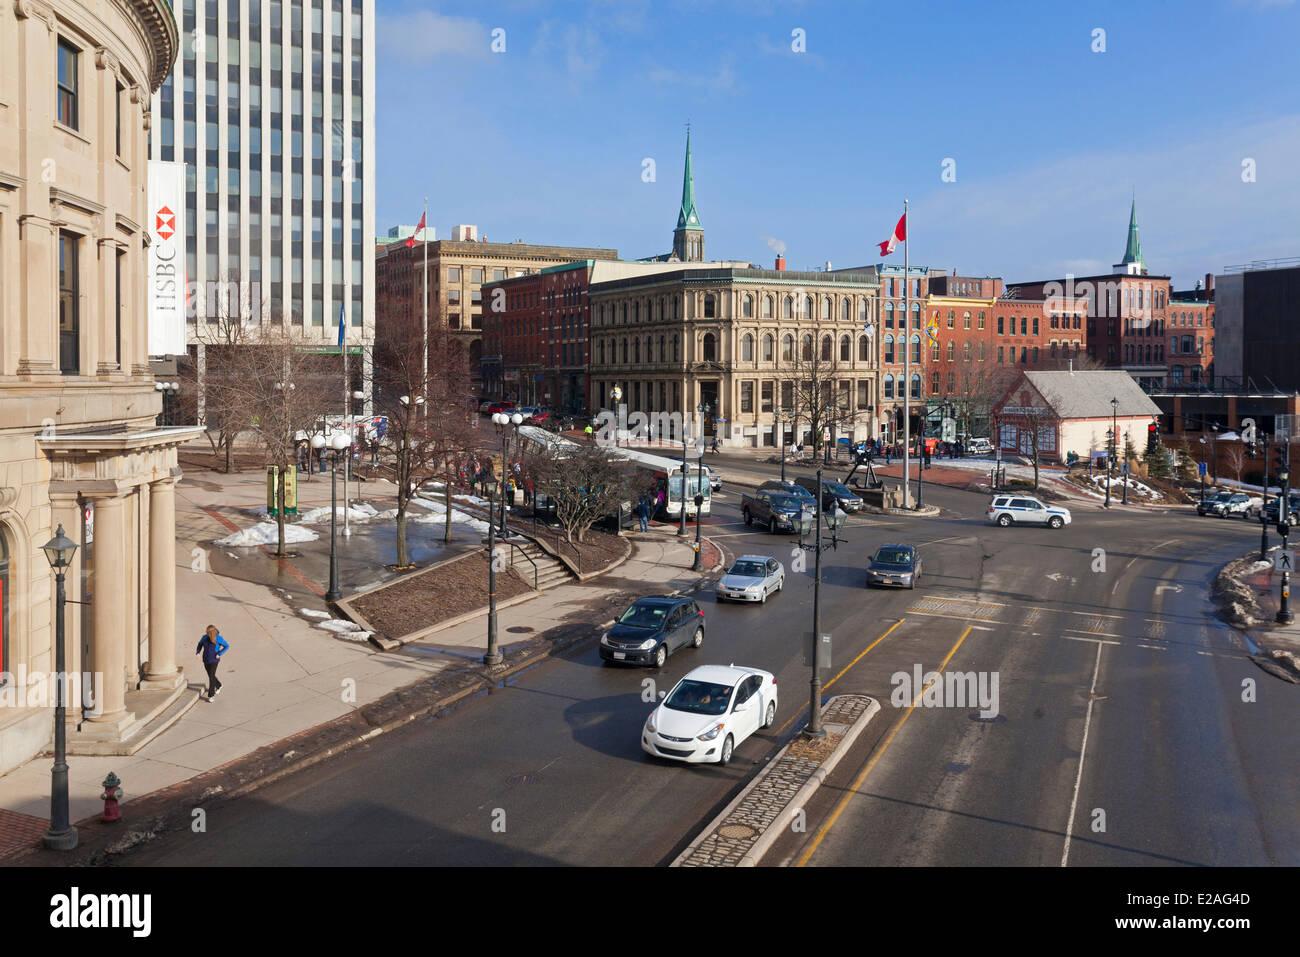 Canada, New Brunswick Province, Saint John, downtown, St. Patrick Street - Stock Image